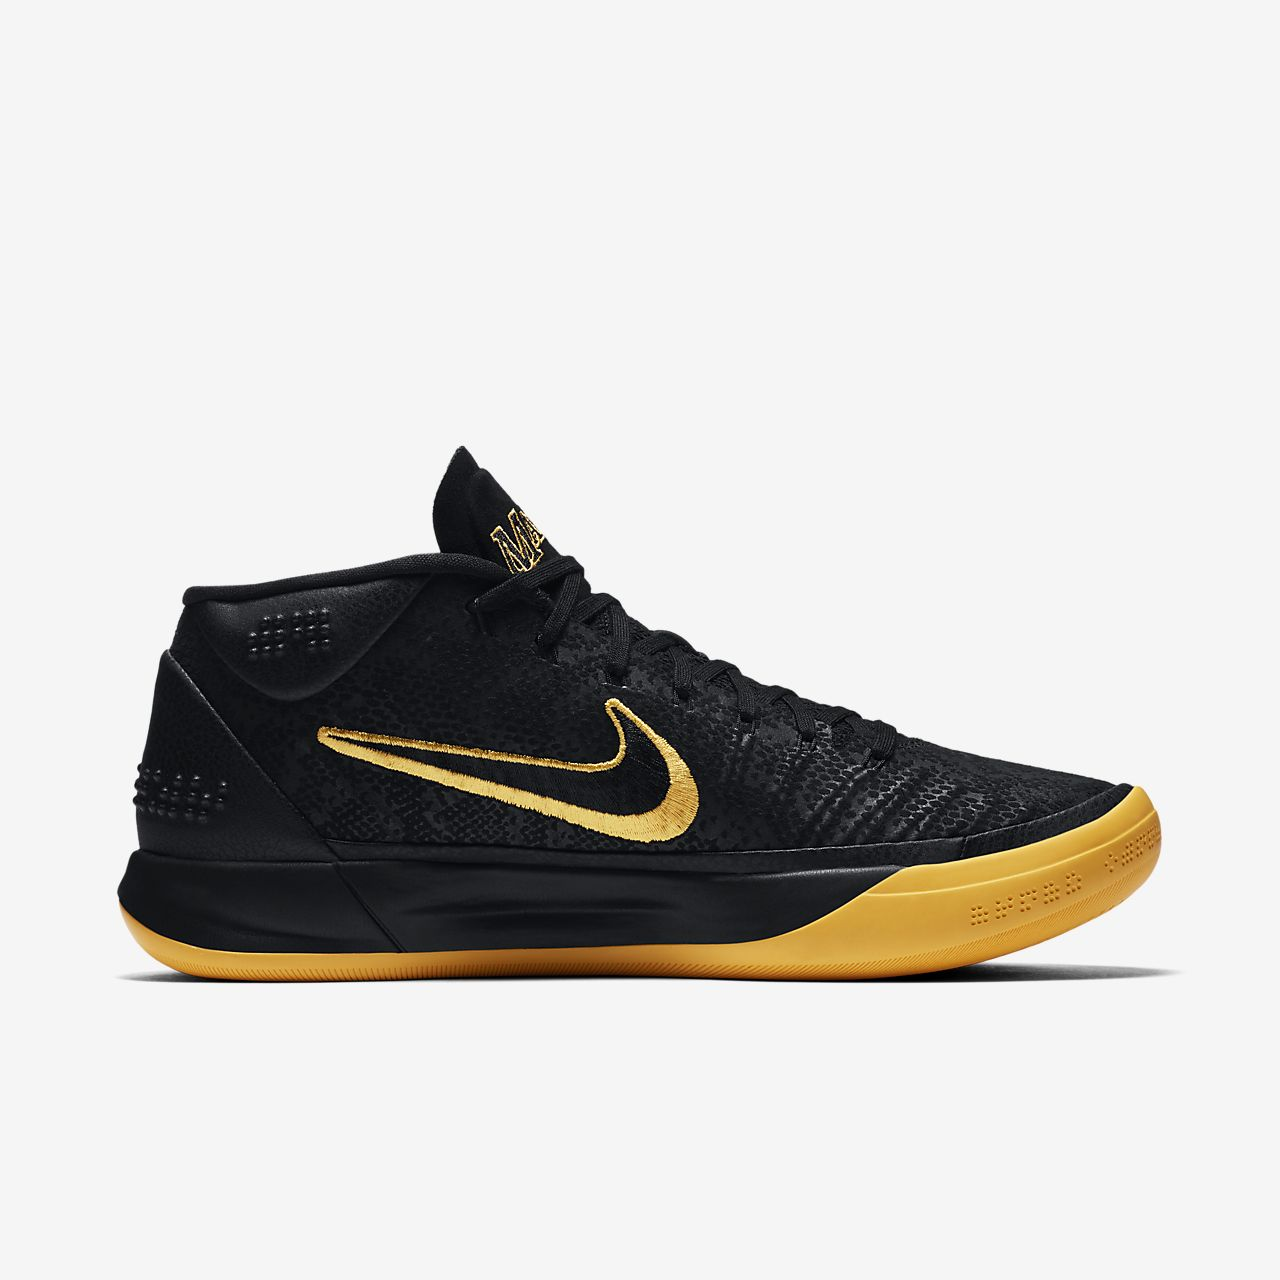 Nike Kobe Black Mamba Men Basketball Shoe